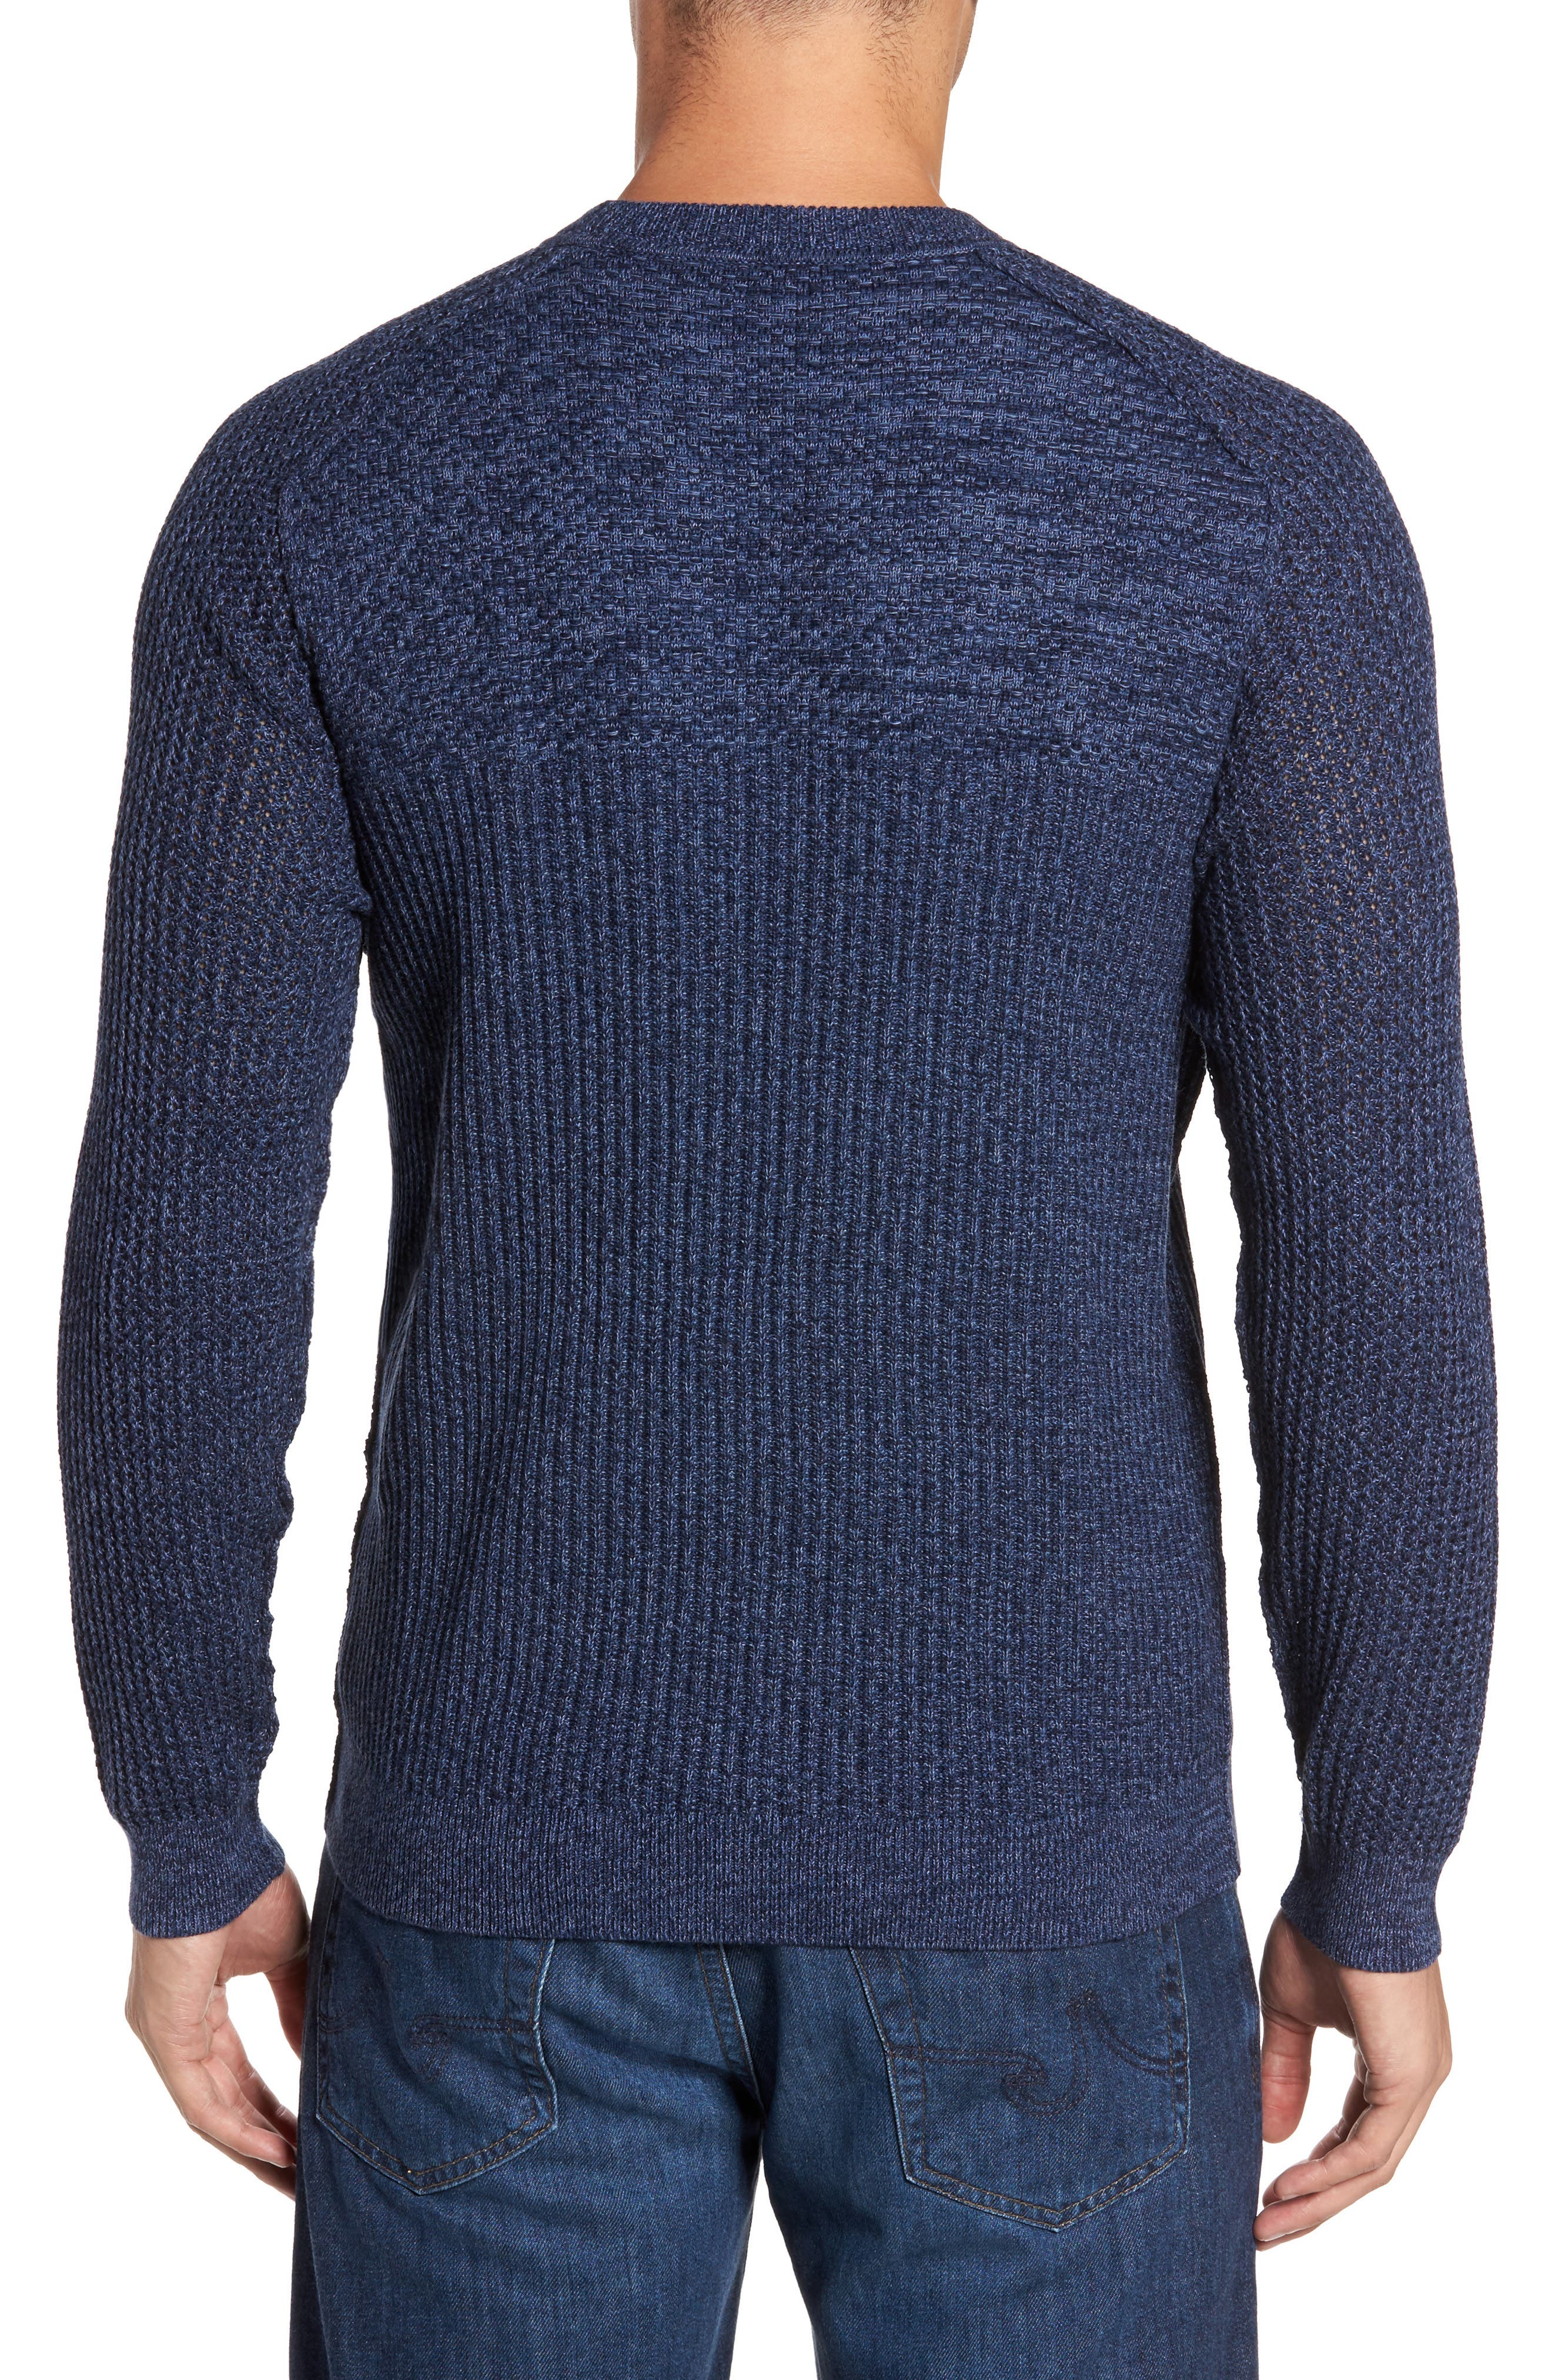 Medina Marl Cotton Sweater,                             Alternate thumbnail 2, color,                             001